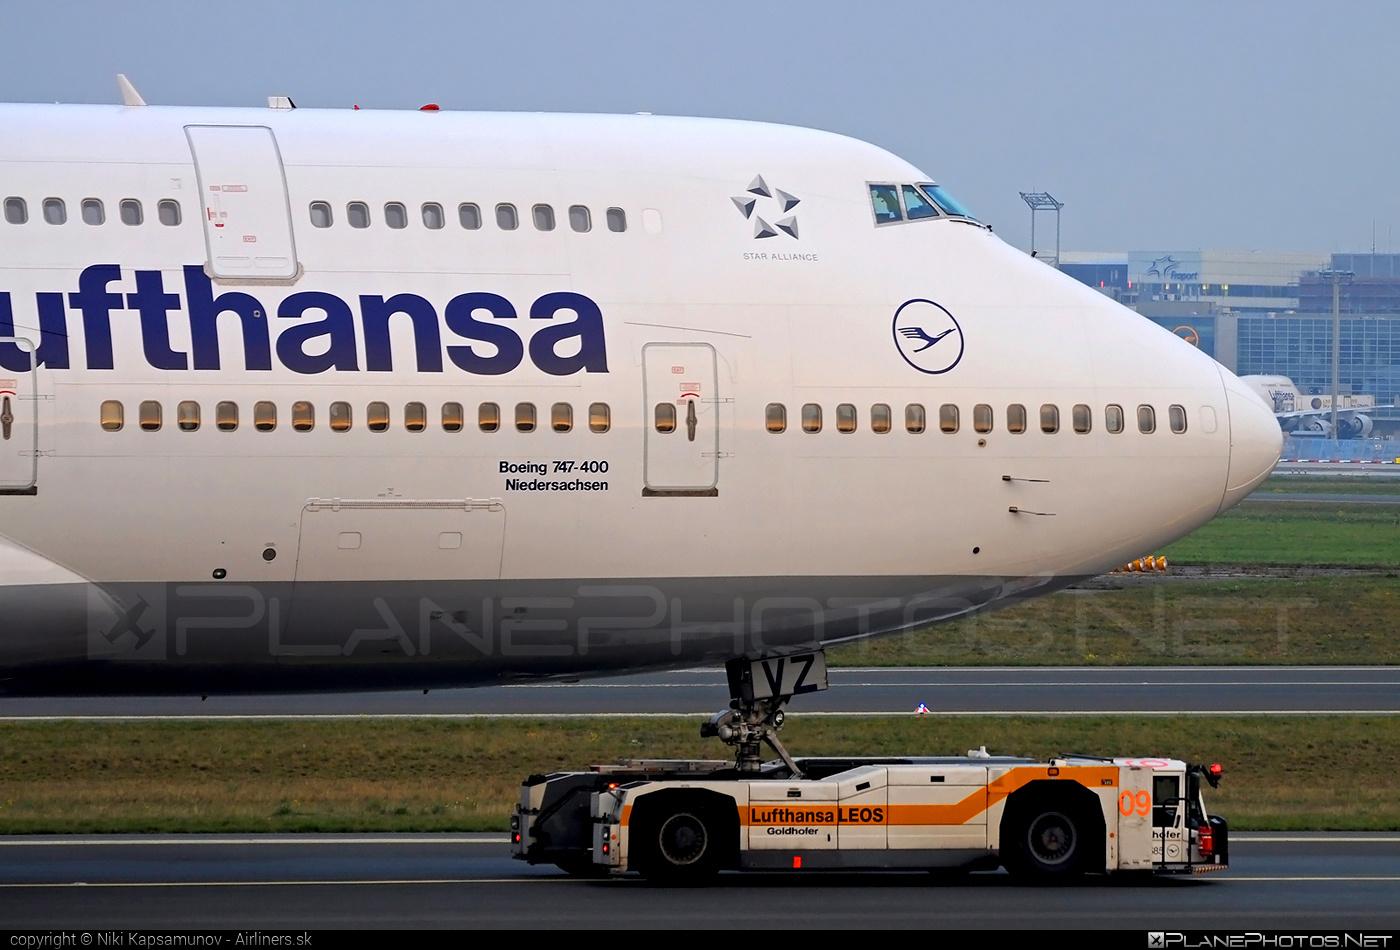 Boeing 747-400 - D-ABVZ operated by Lufthansa #b747 #boeing #boeing747 #jumbo #lufthansa